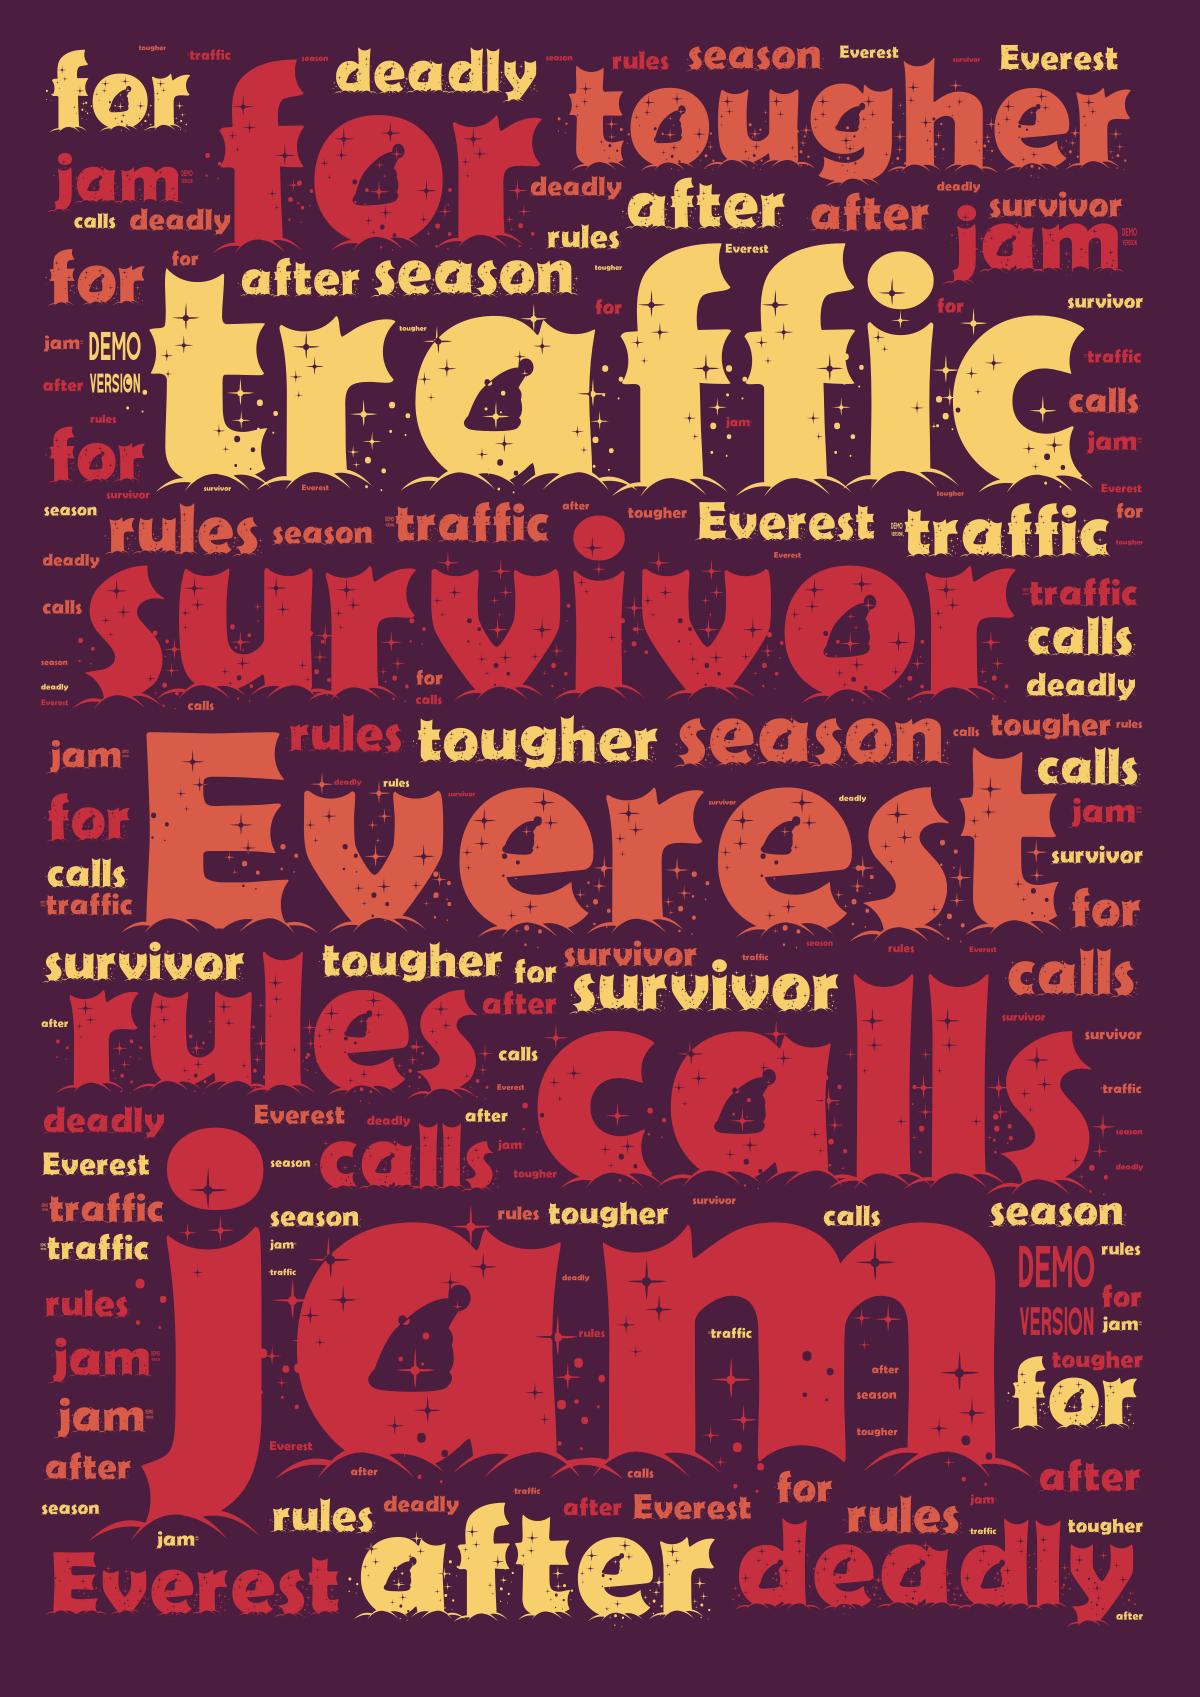 Everest 'traffic jam' survivor calls for tougher rules after deadly season